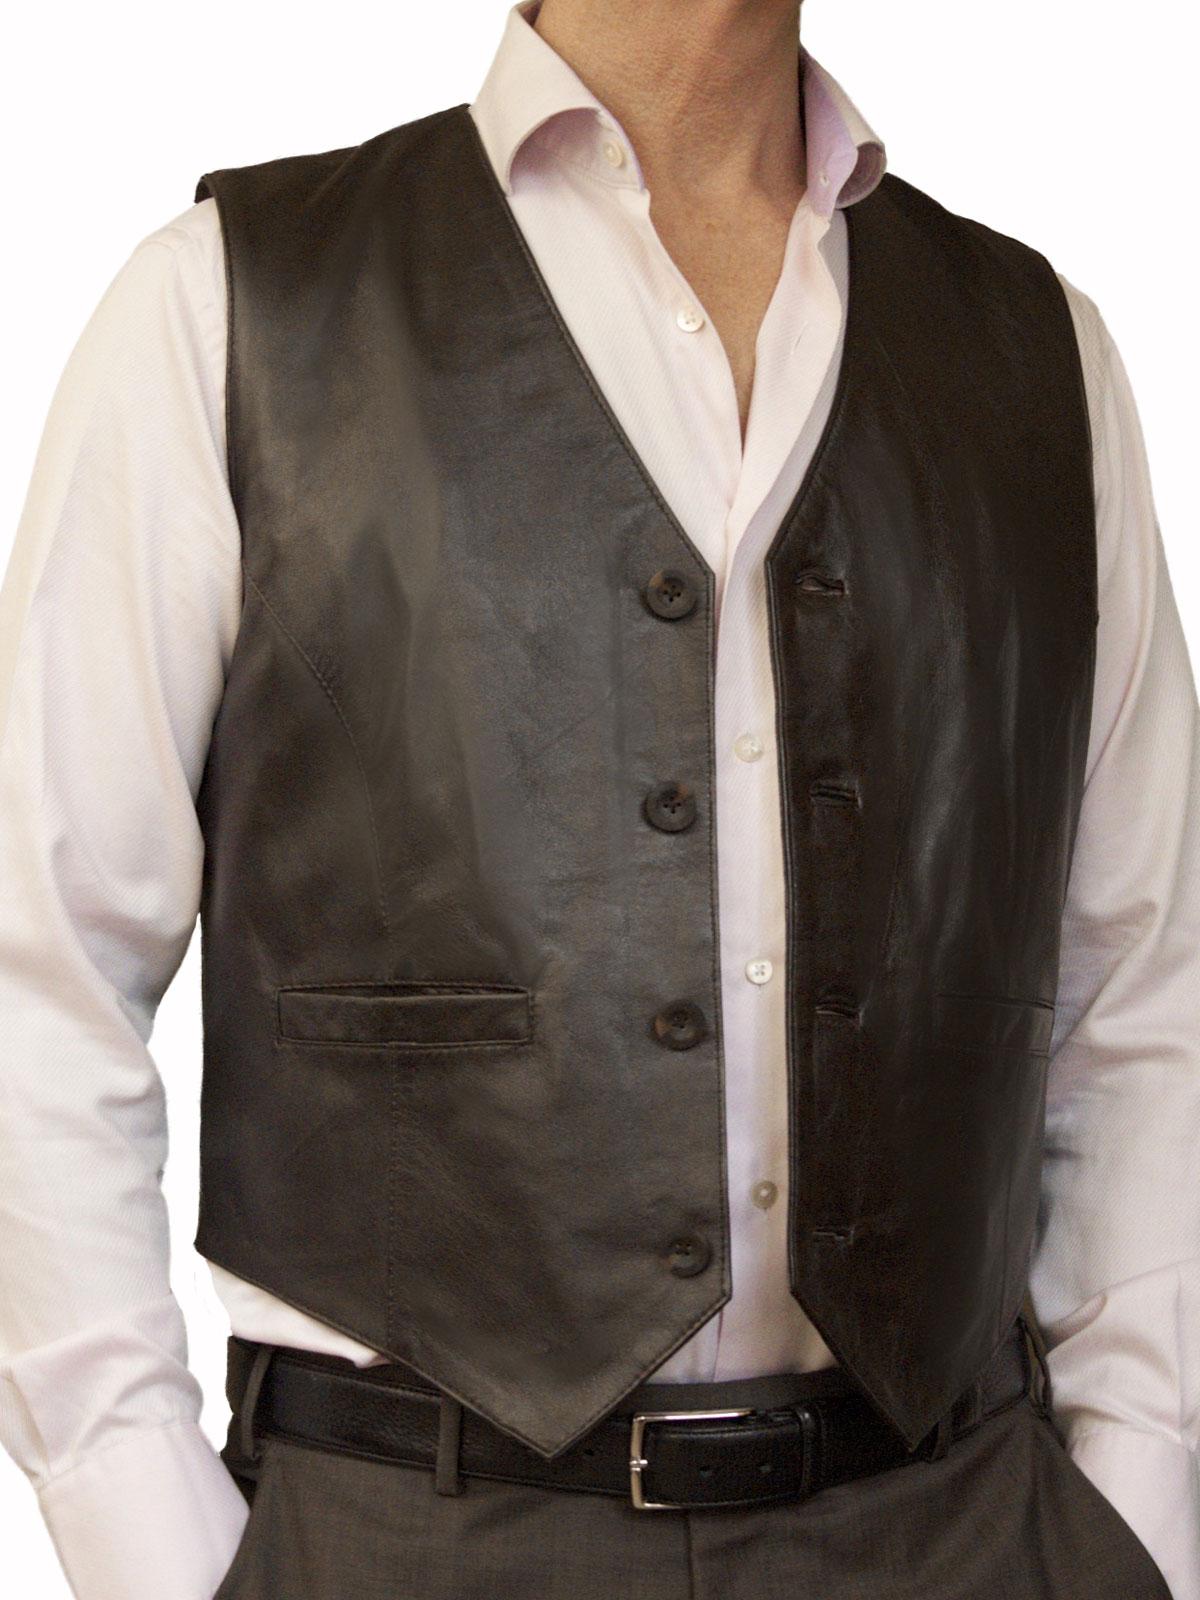 Mens Luxury Leather Waistcoat, plain back